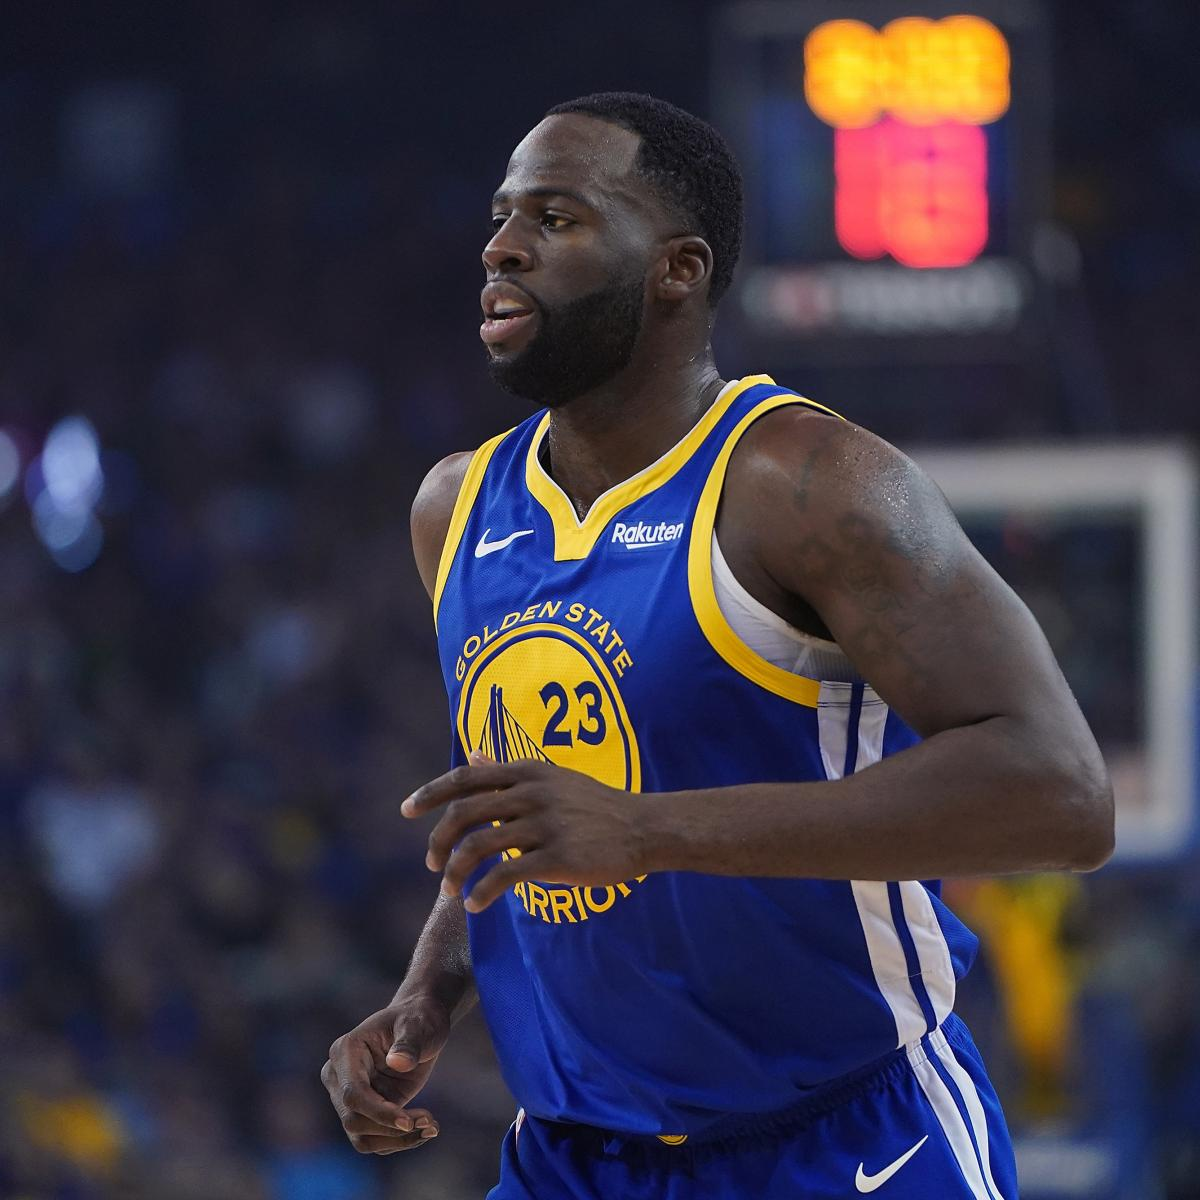 Warriors Vs Nets Full Game Highlights: Warriors Rumors: Draymond Green To Return From Injuries On